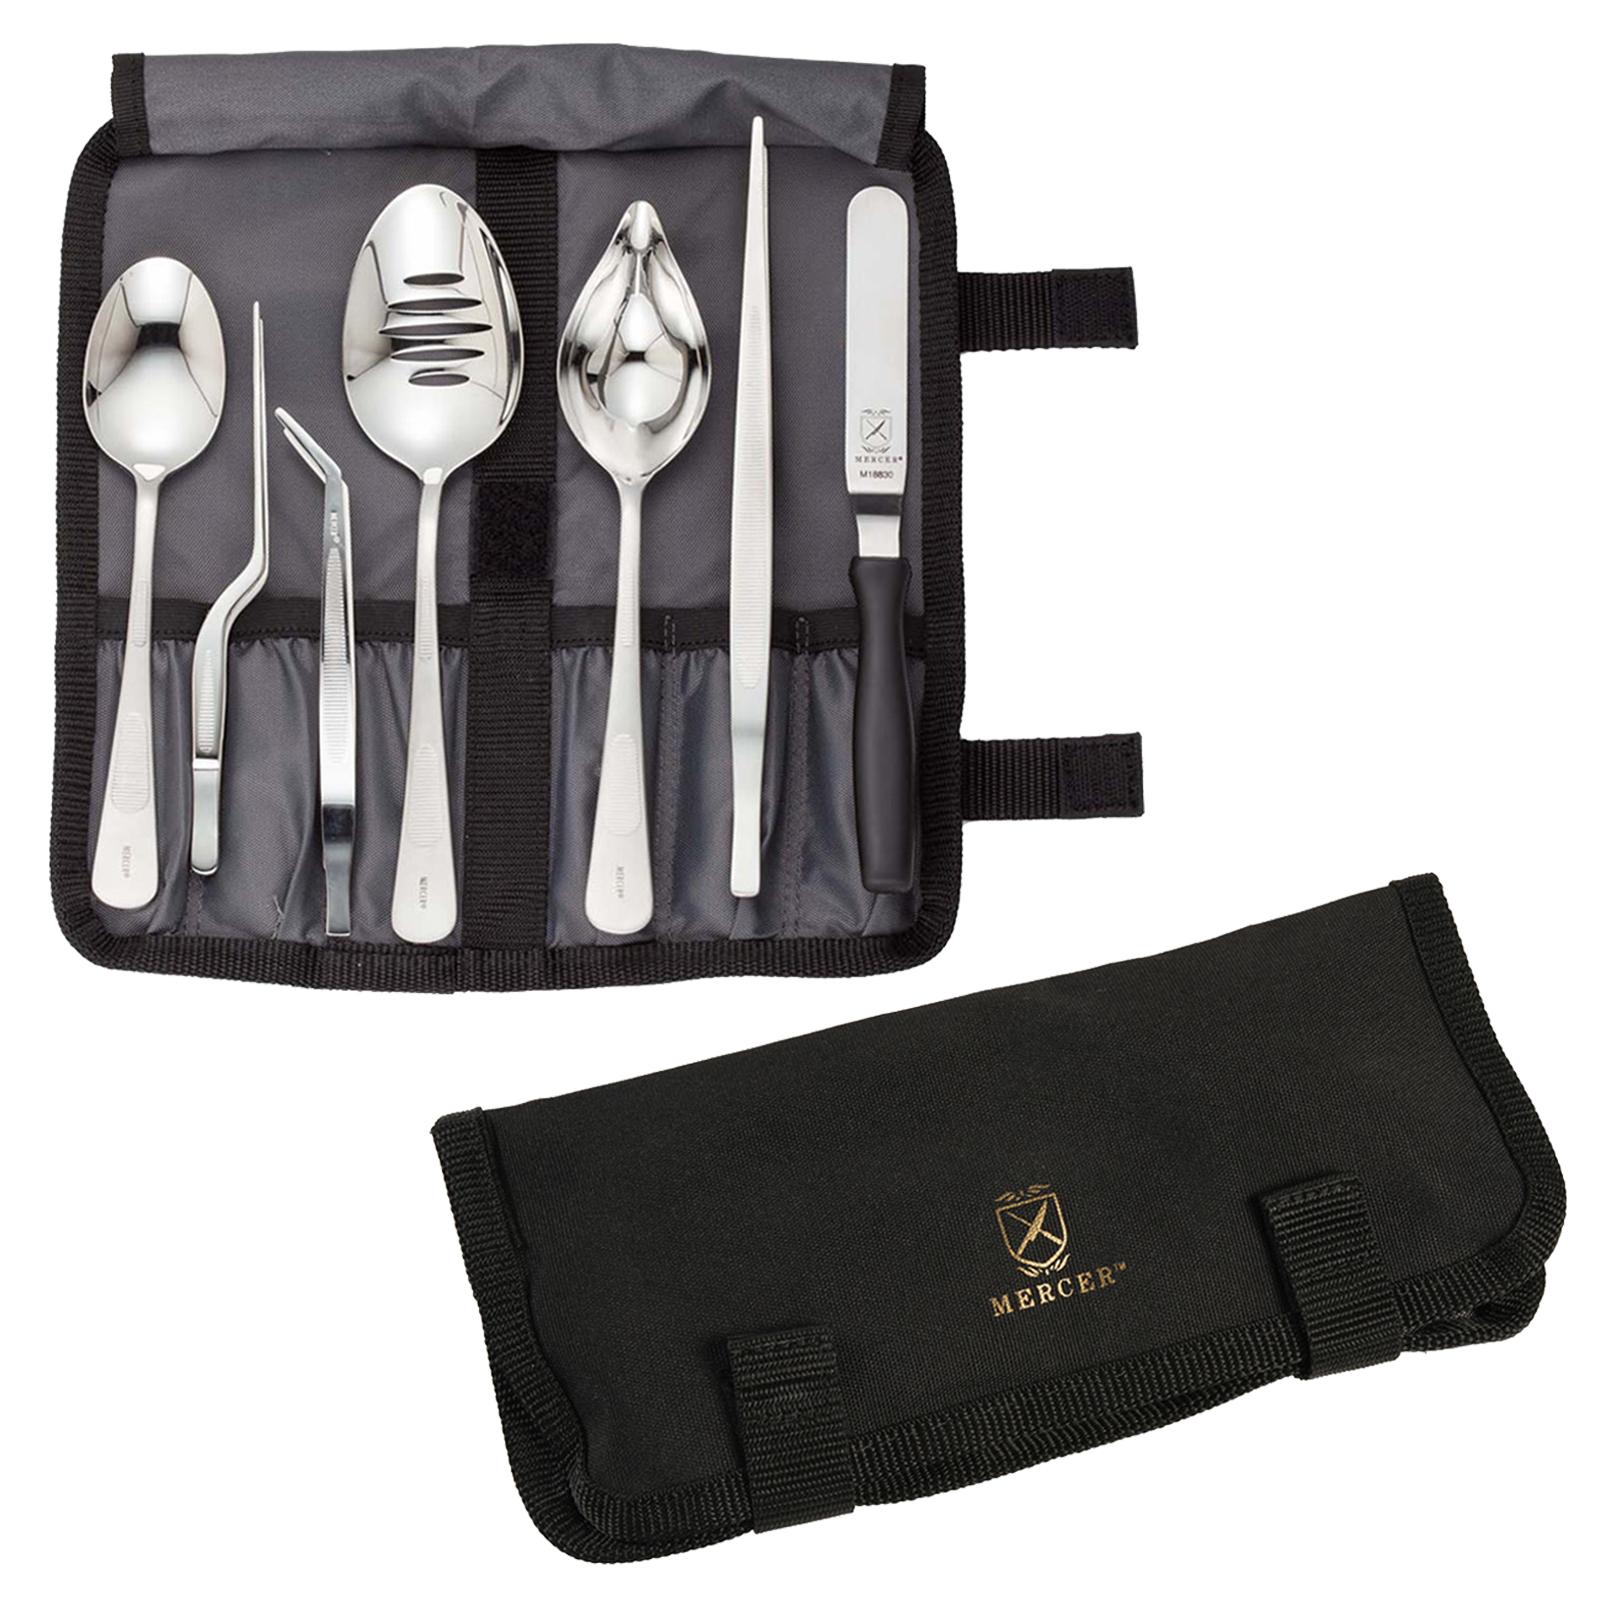 Mercer Culinary M35149 plating tool